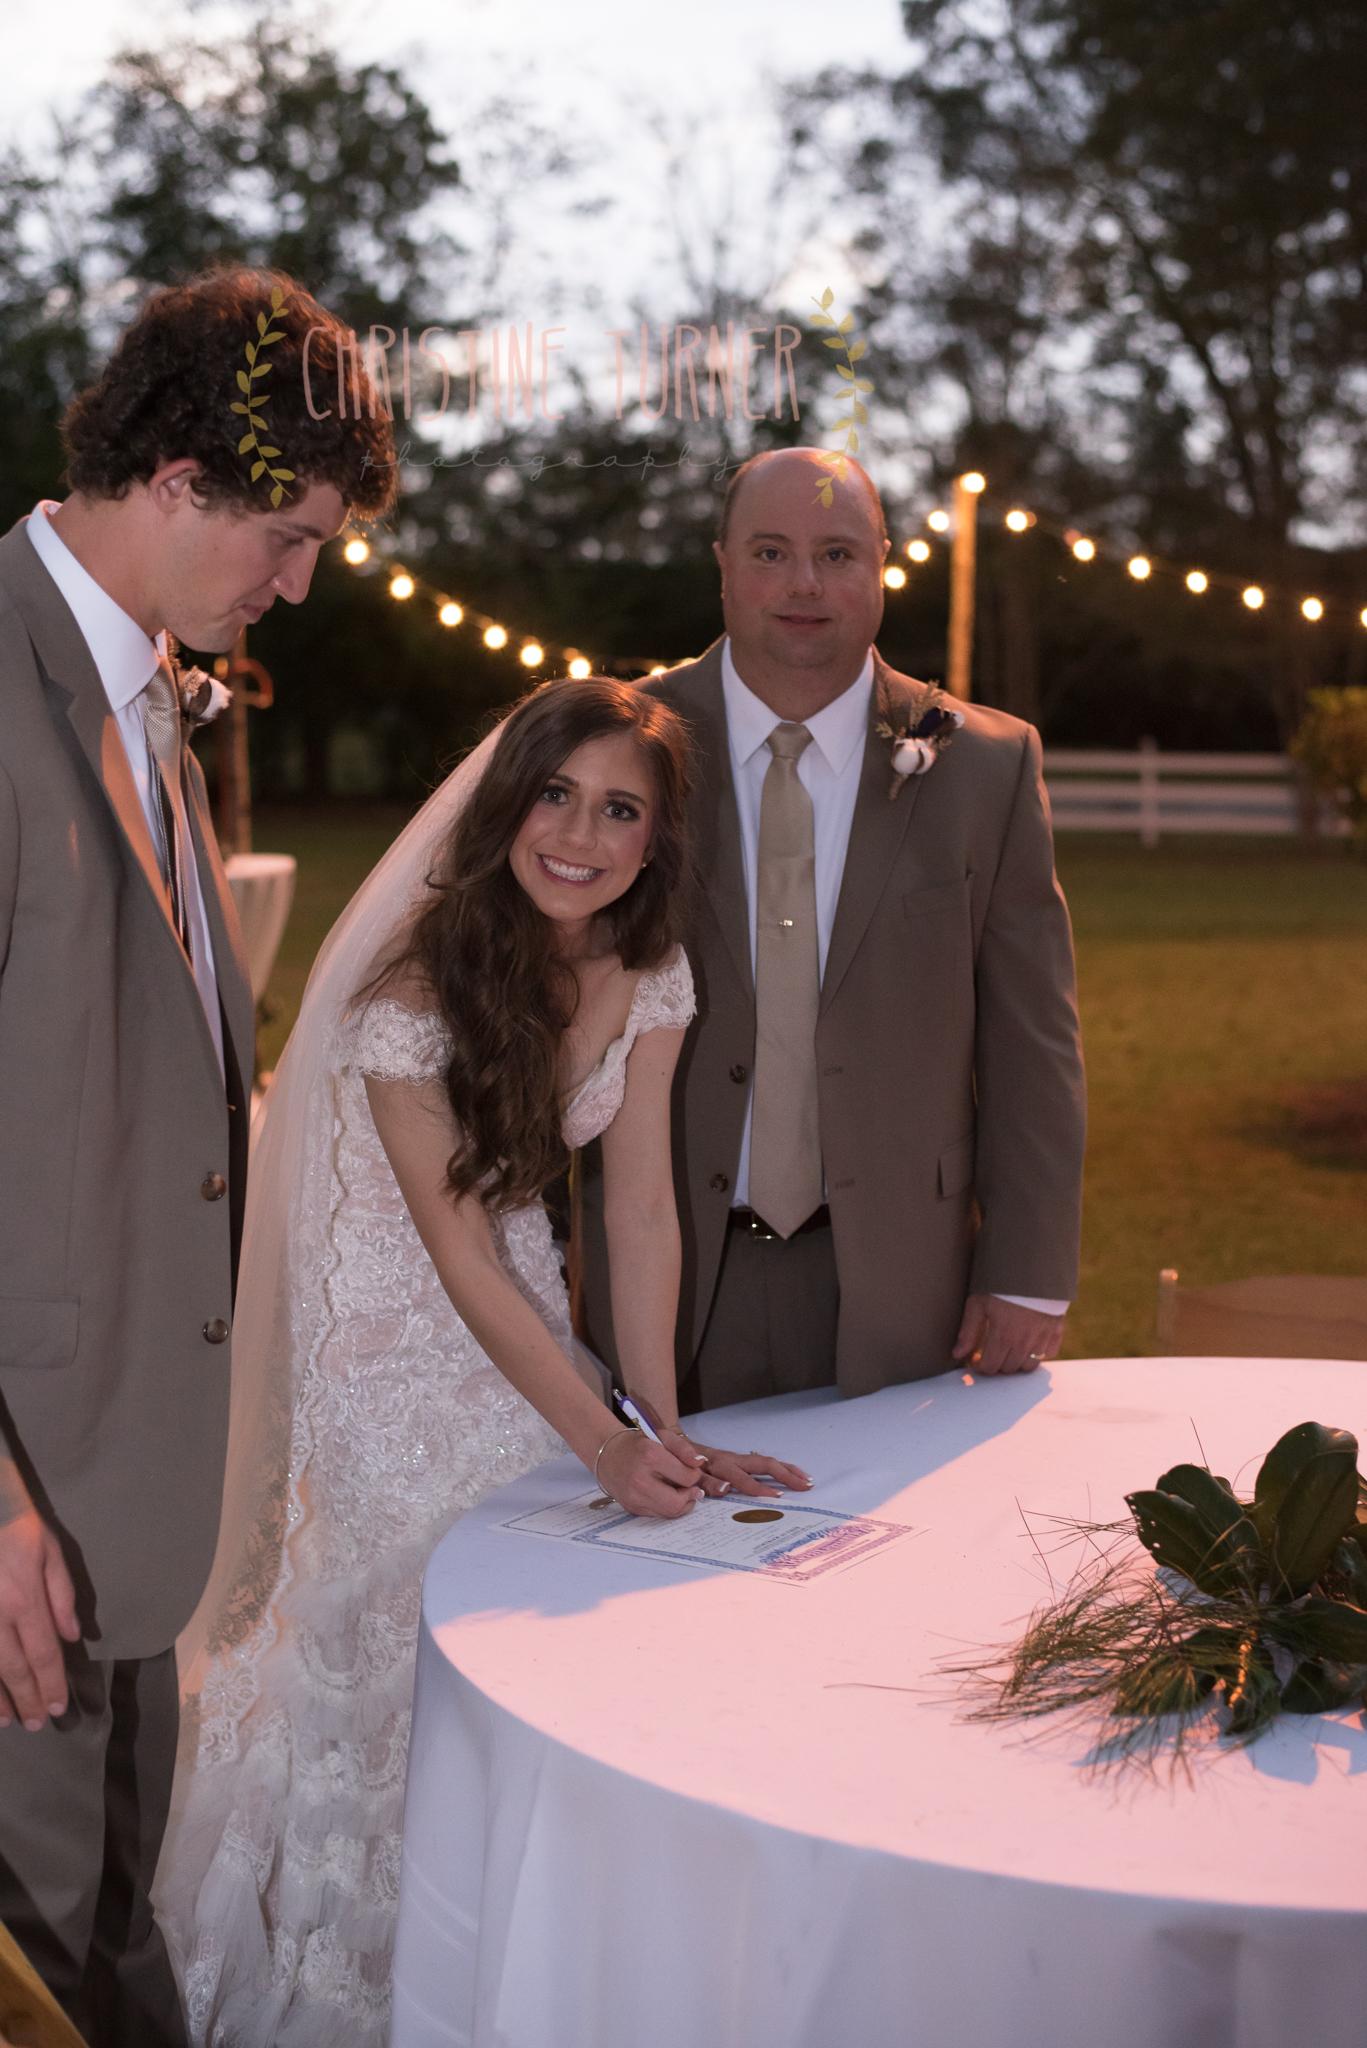 Gill Wedding (488 of 498)